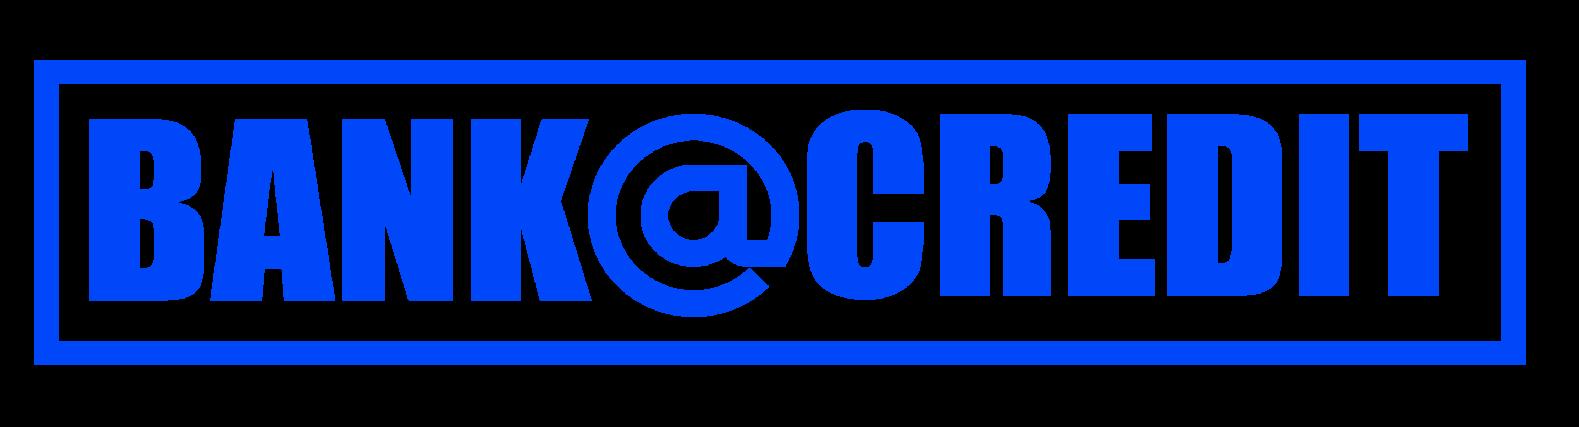 Logo Bankacredit